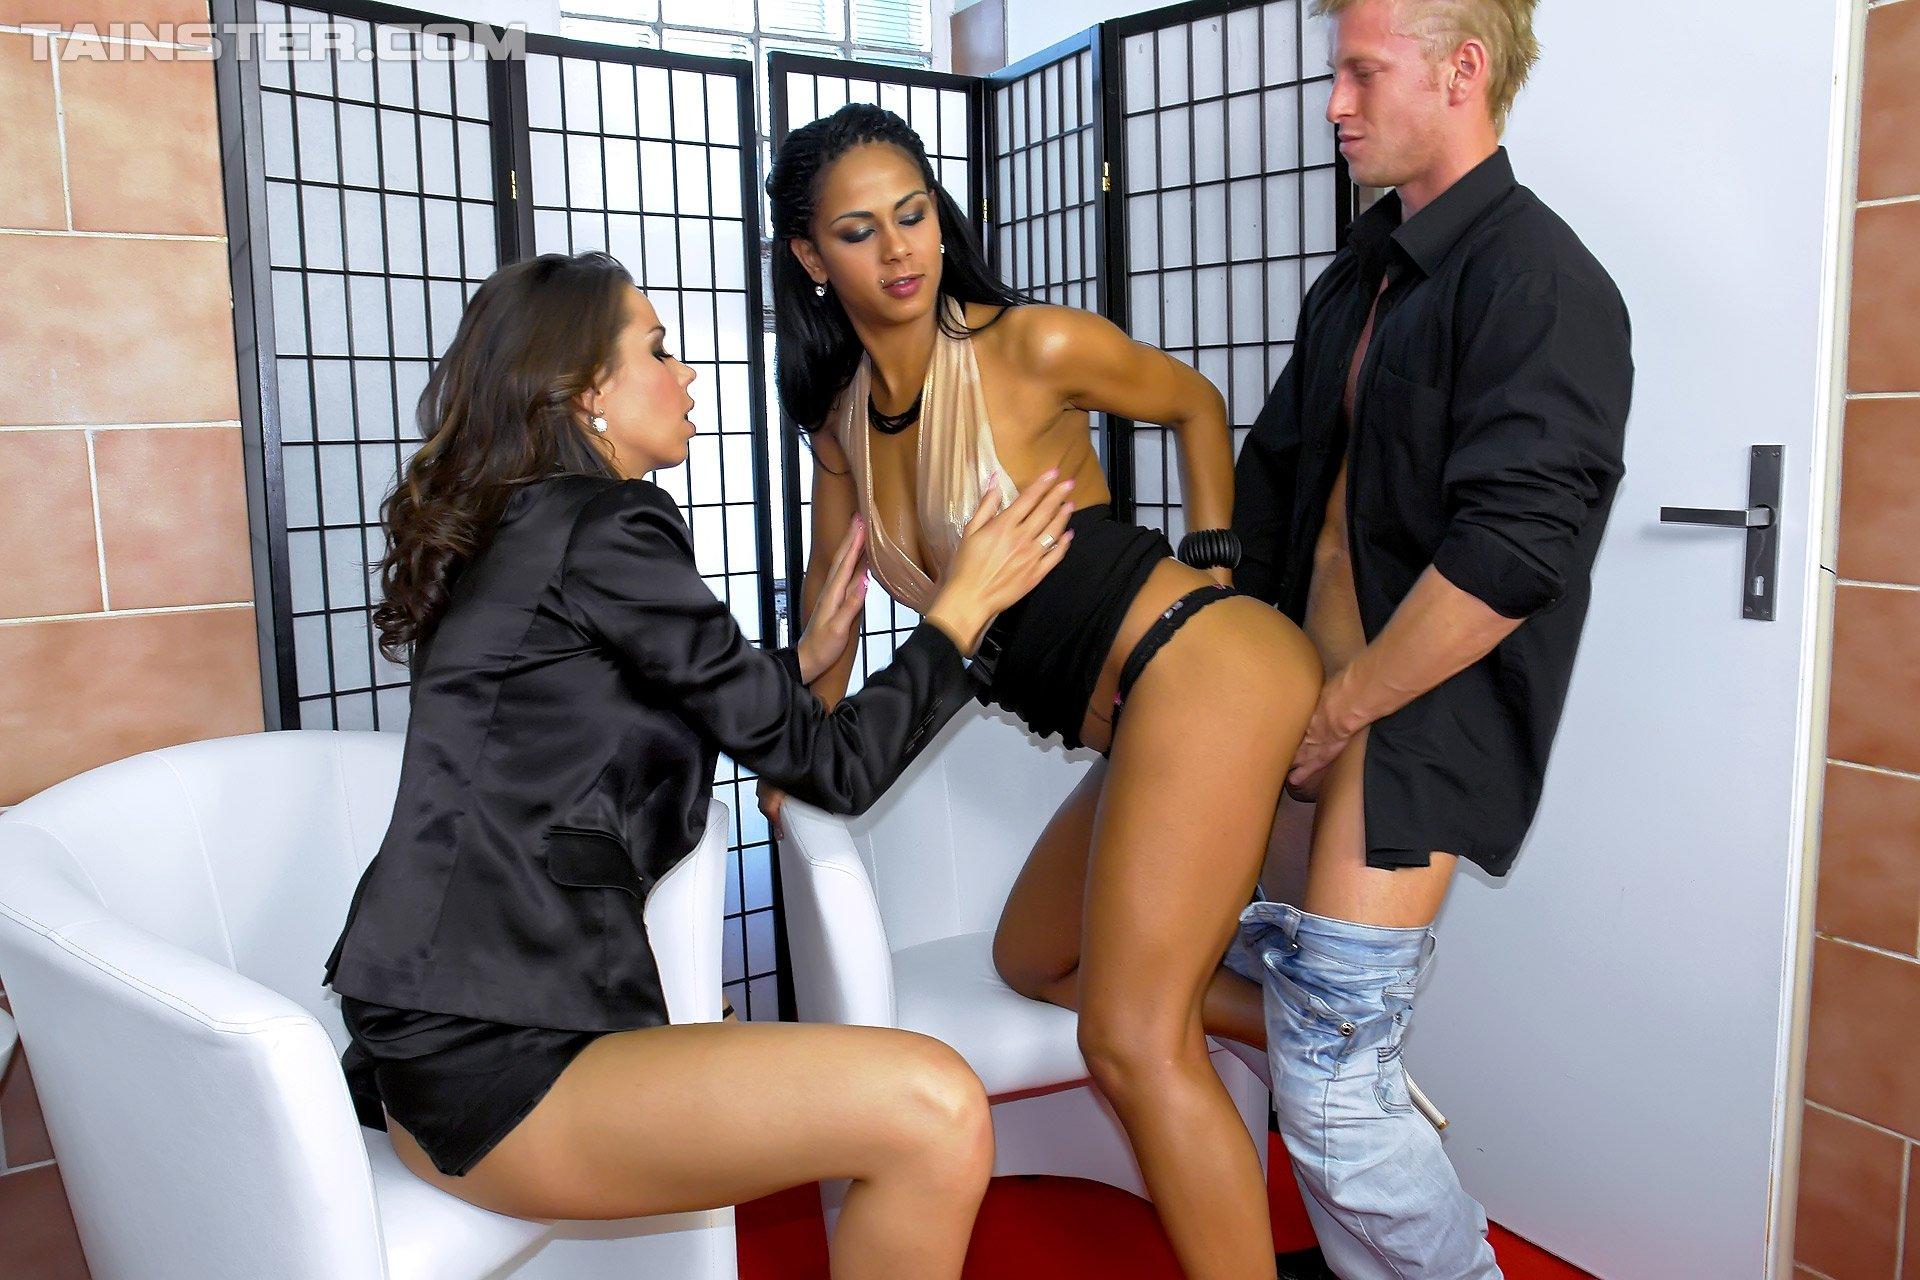 Секс в одежде - Фото галерея 866146